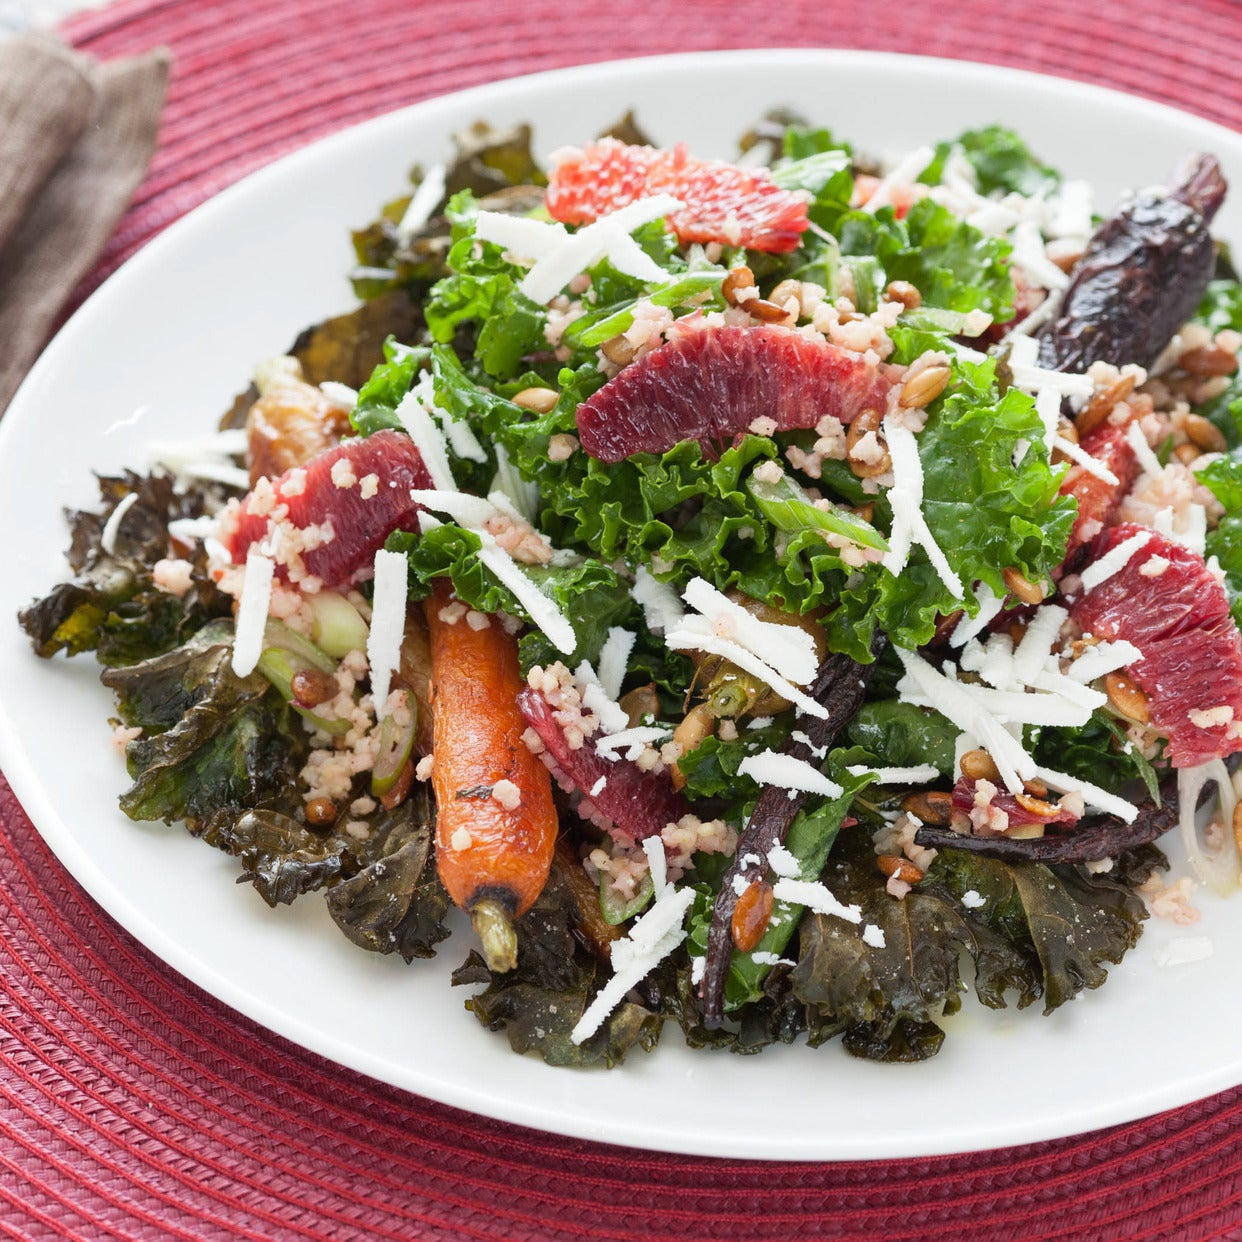 Roasted Kale & Heirloom Carrot Salad with Pepitas, Ricotta Salata & Champagne-Cardamom Vinaigrette